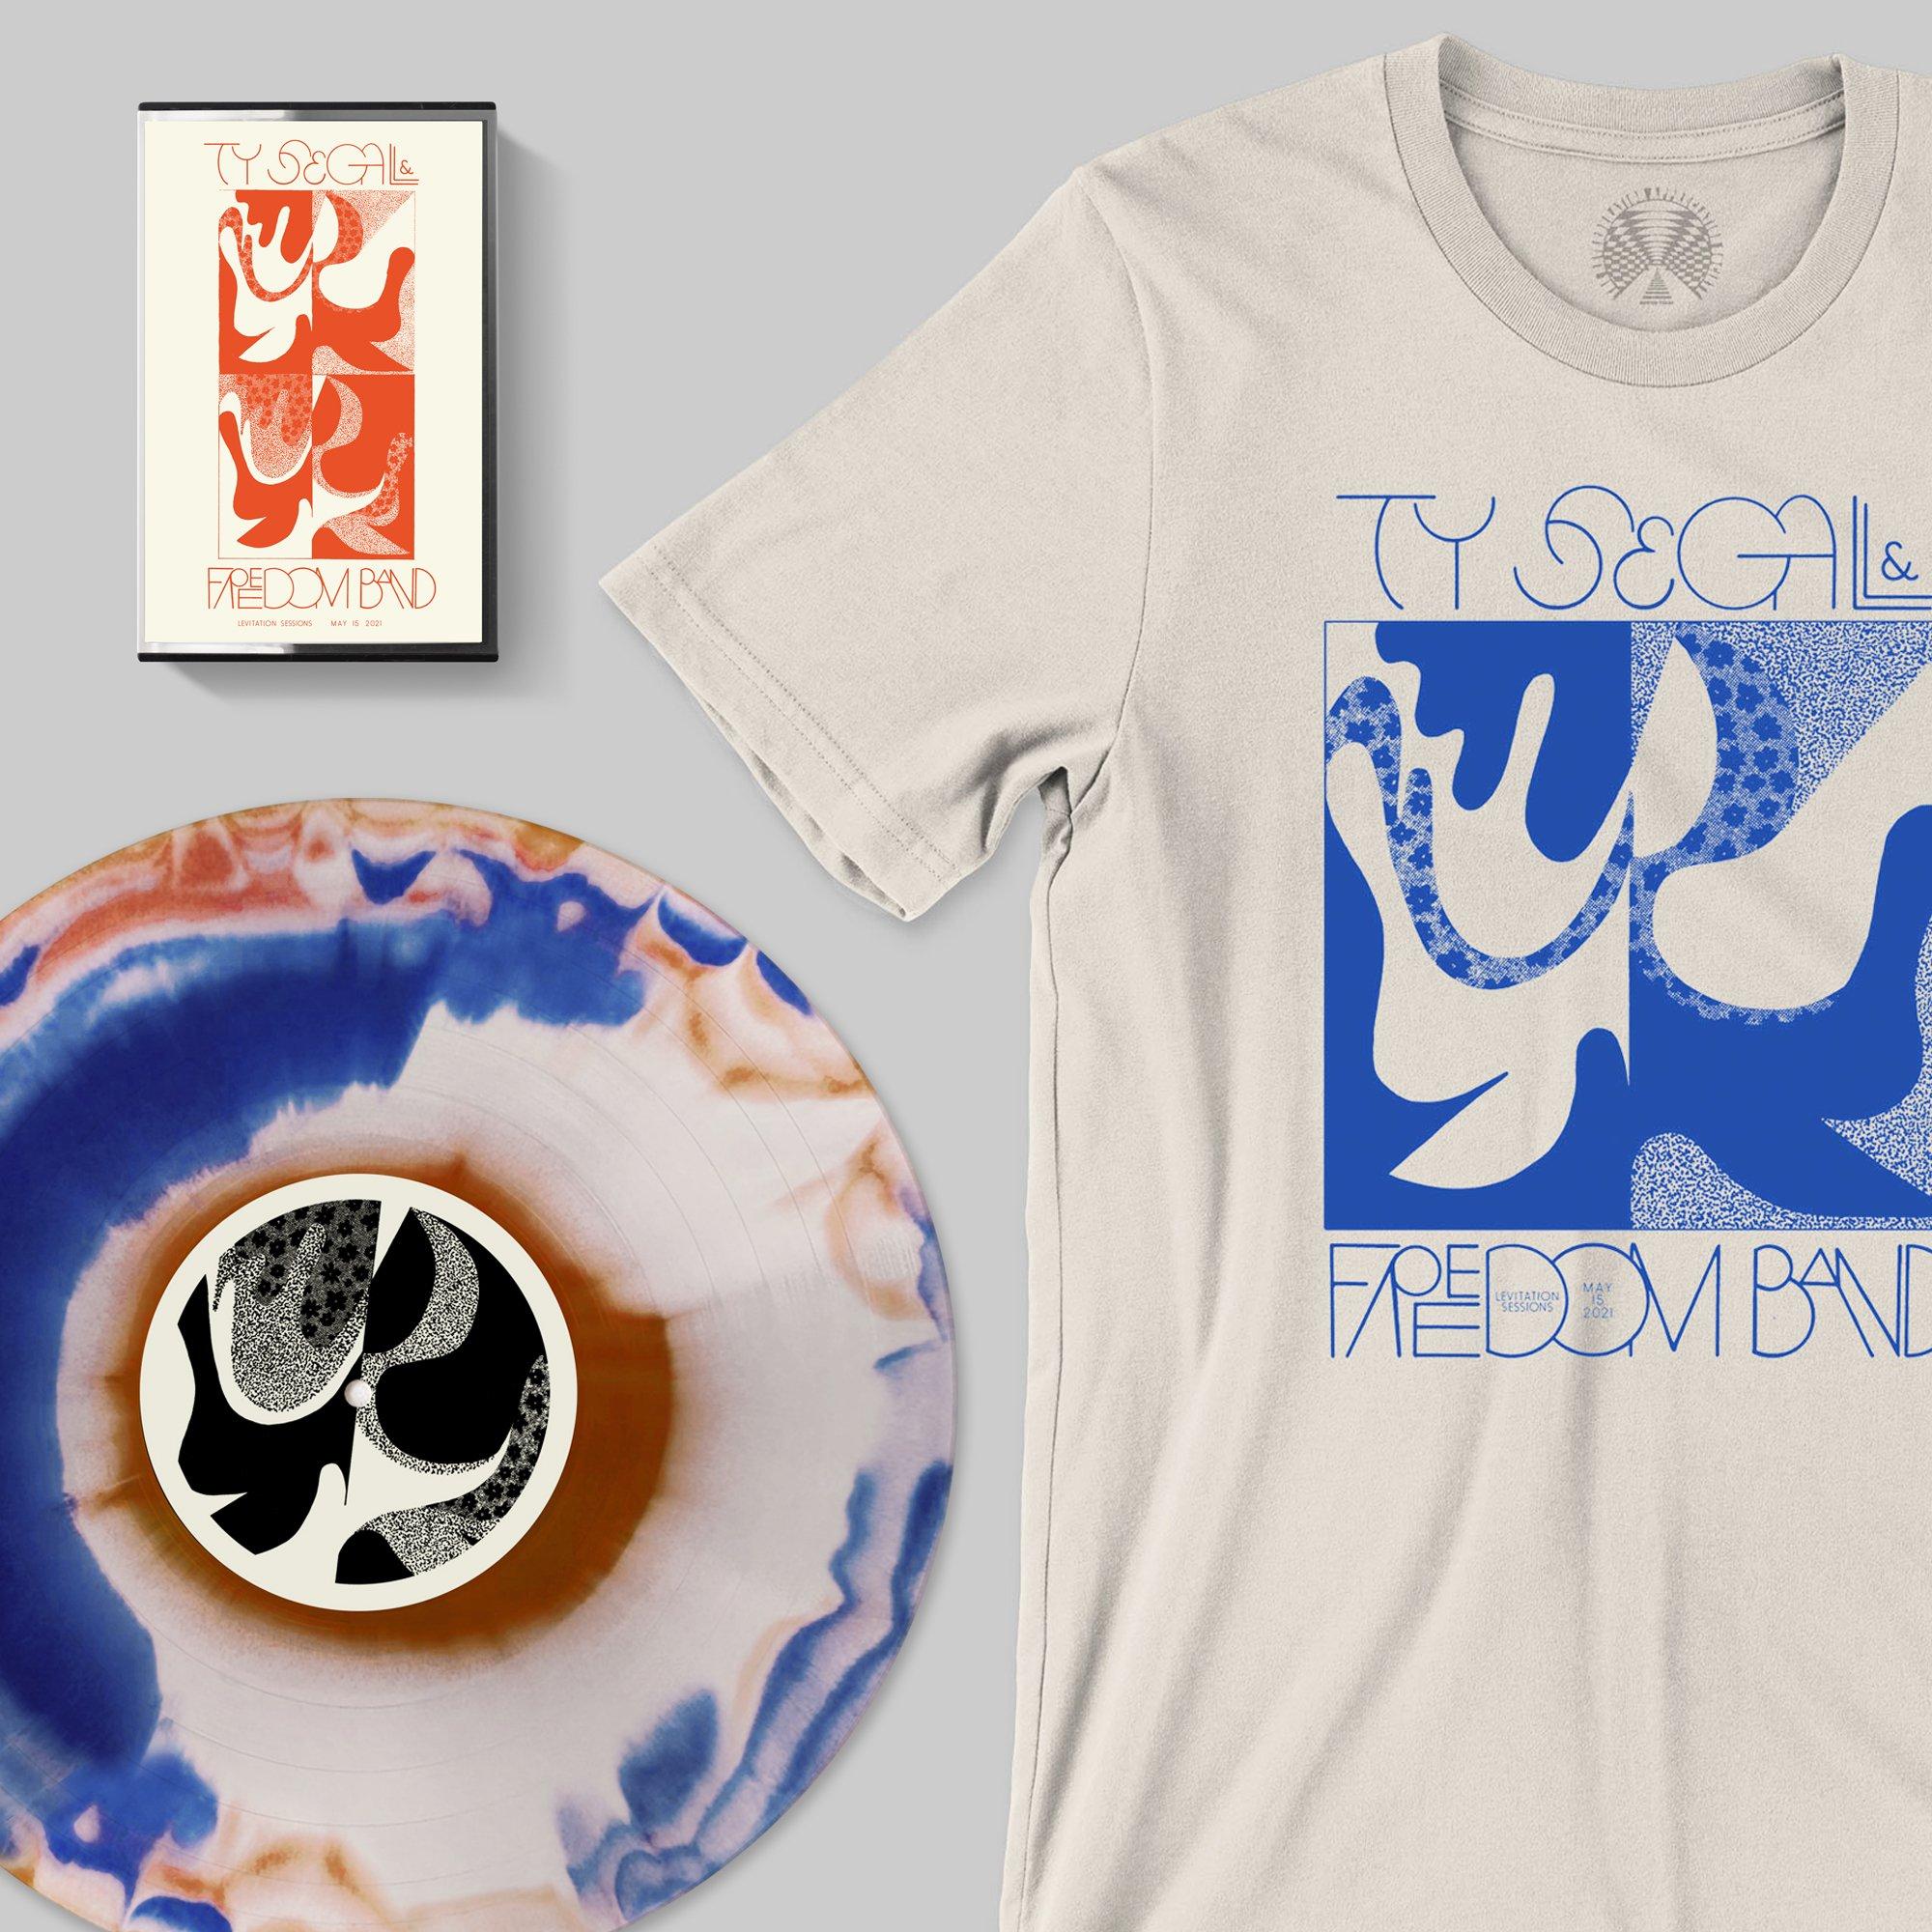 Ty Segall & Freedom Band: Levitation Session (Orange/Blue/Bone Swirl Wax | Limited)